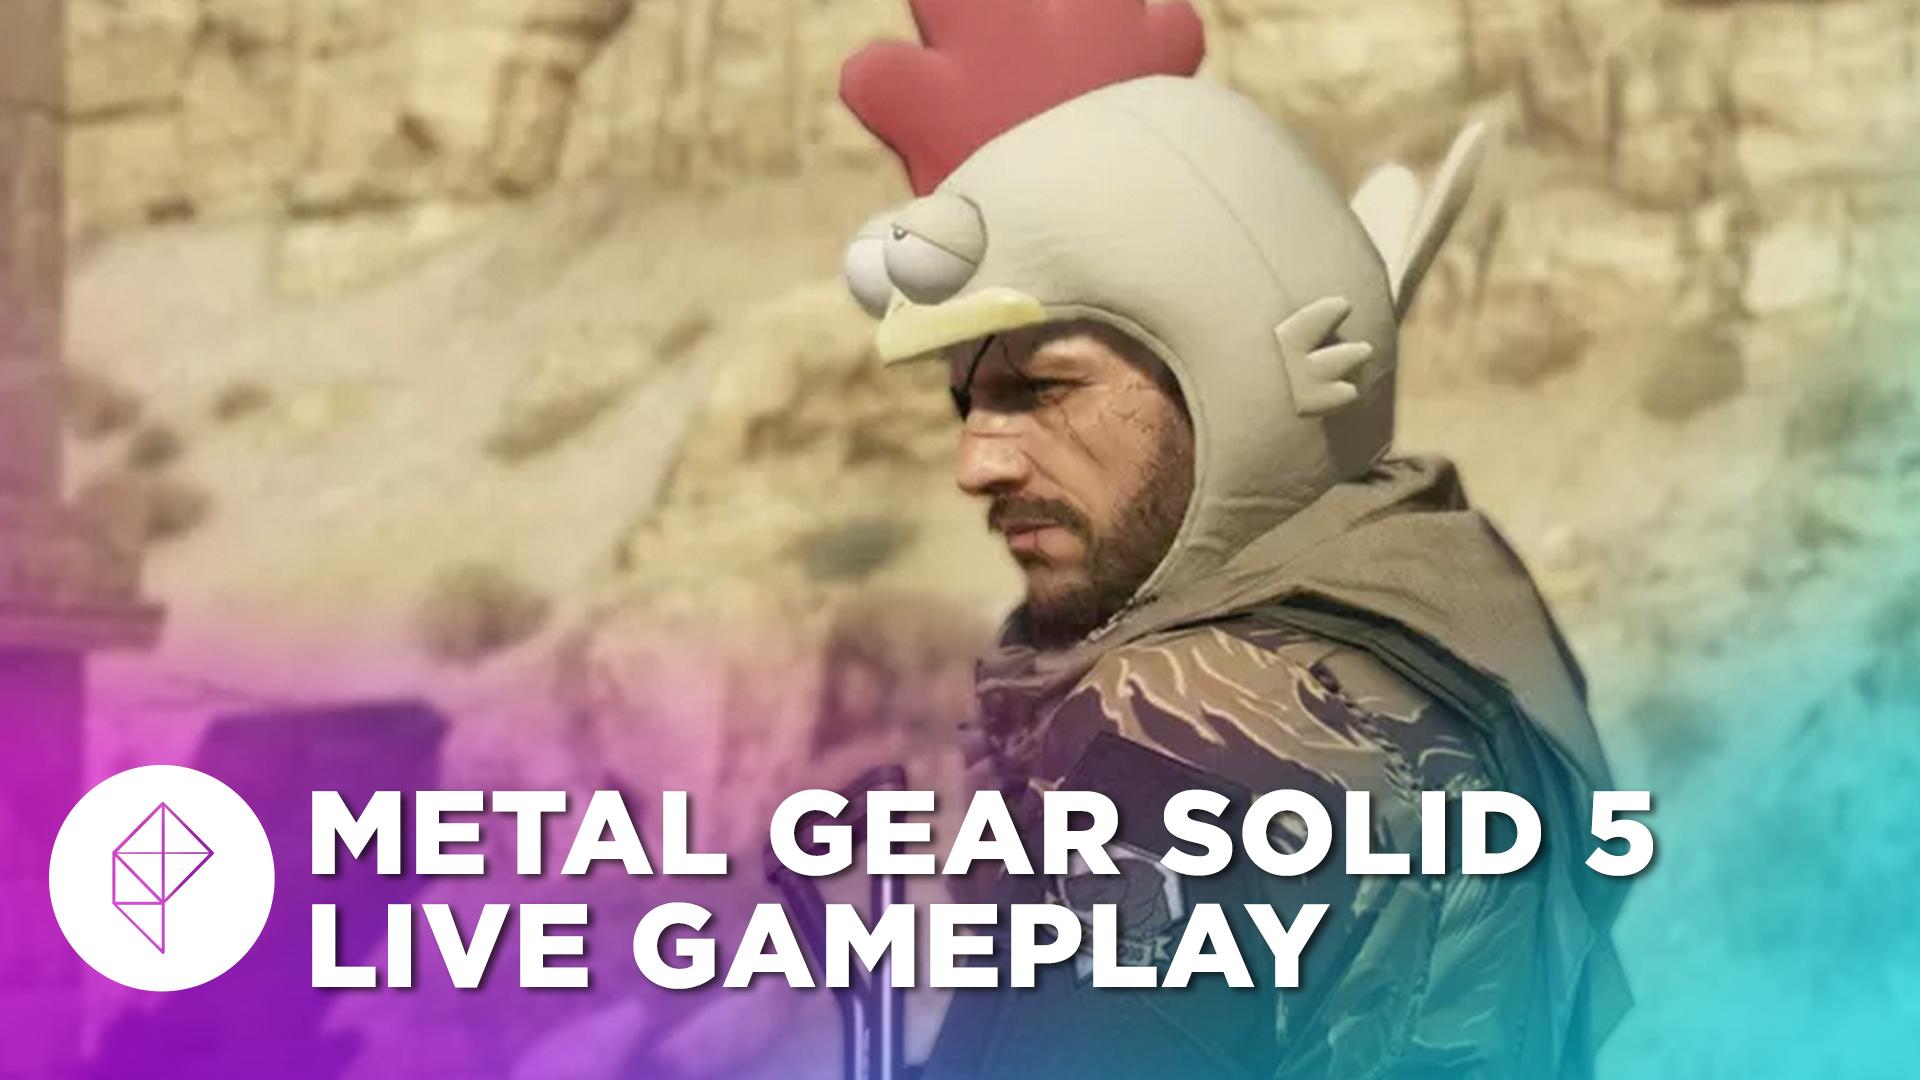 Watch us play Metal Gear Solid 5: The Phantom Pain live